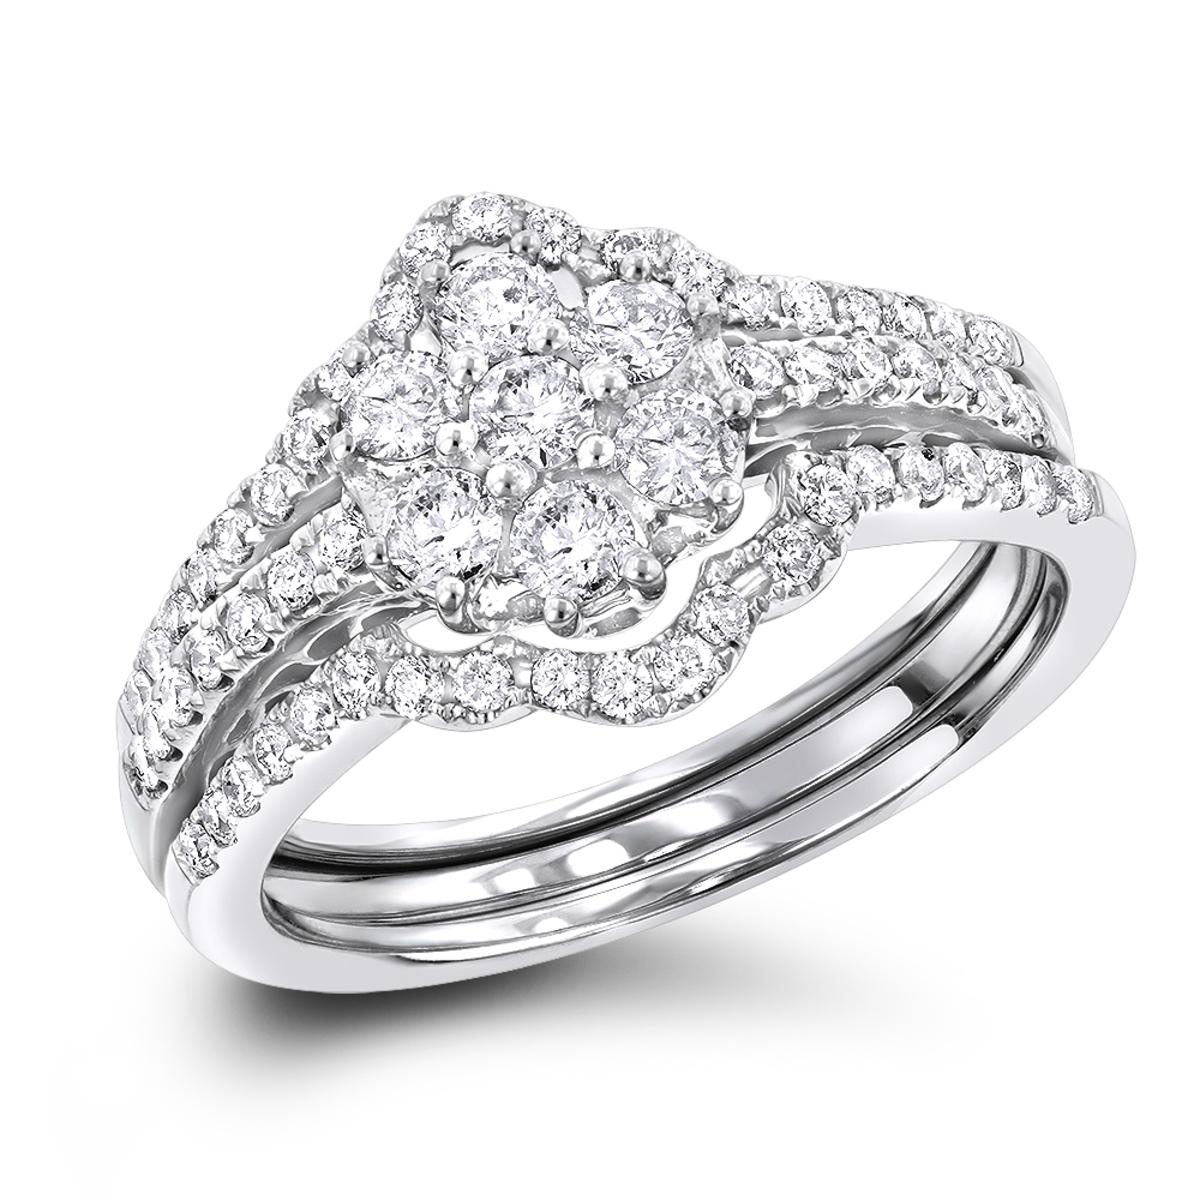 14K Gold Cluster Diamond Ring Set Trio 1.11ct